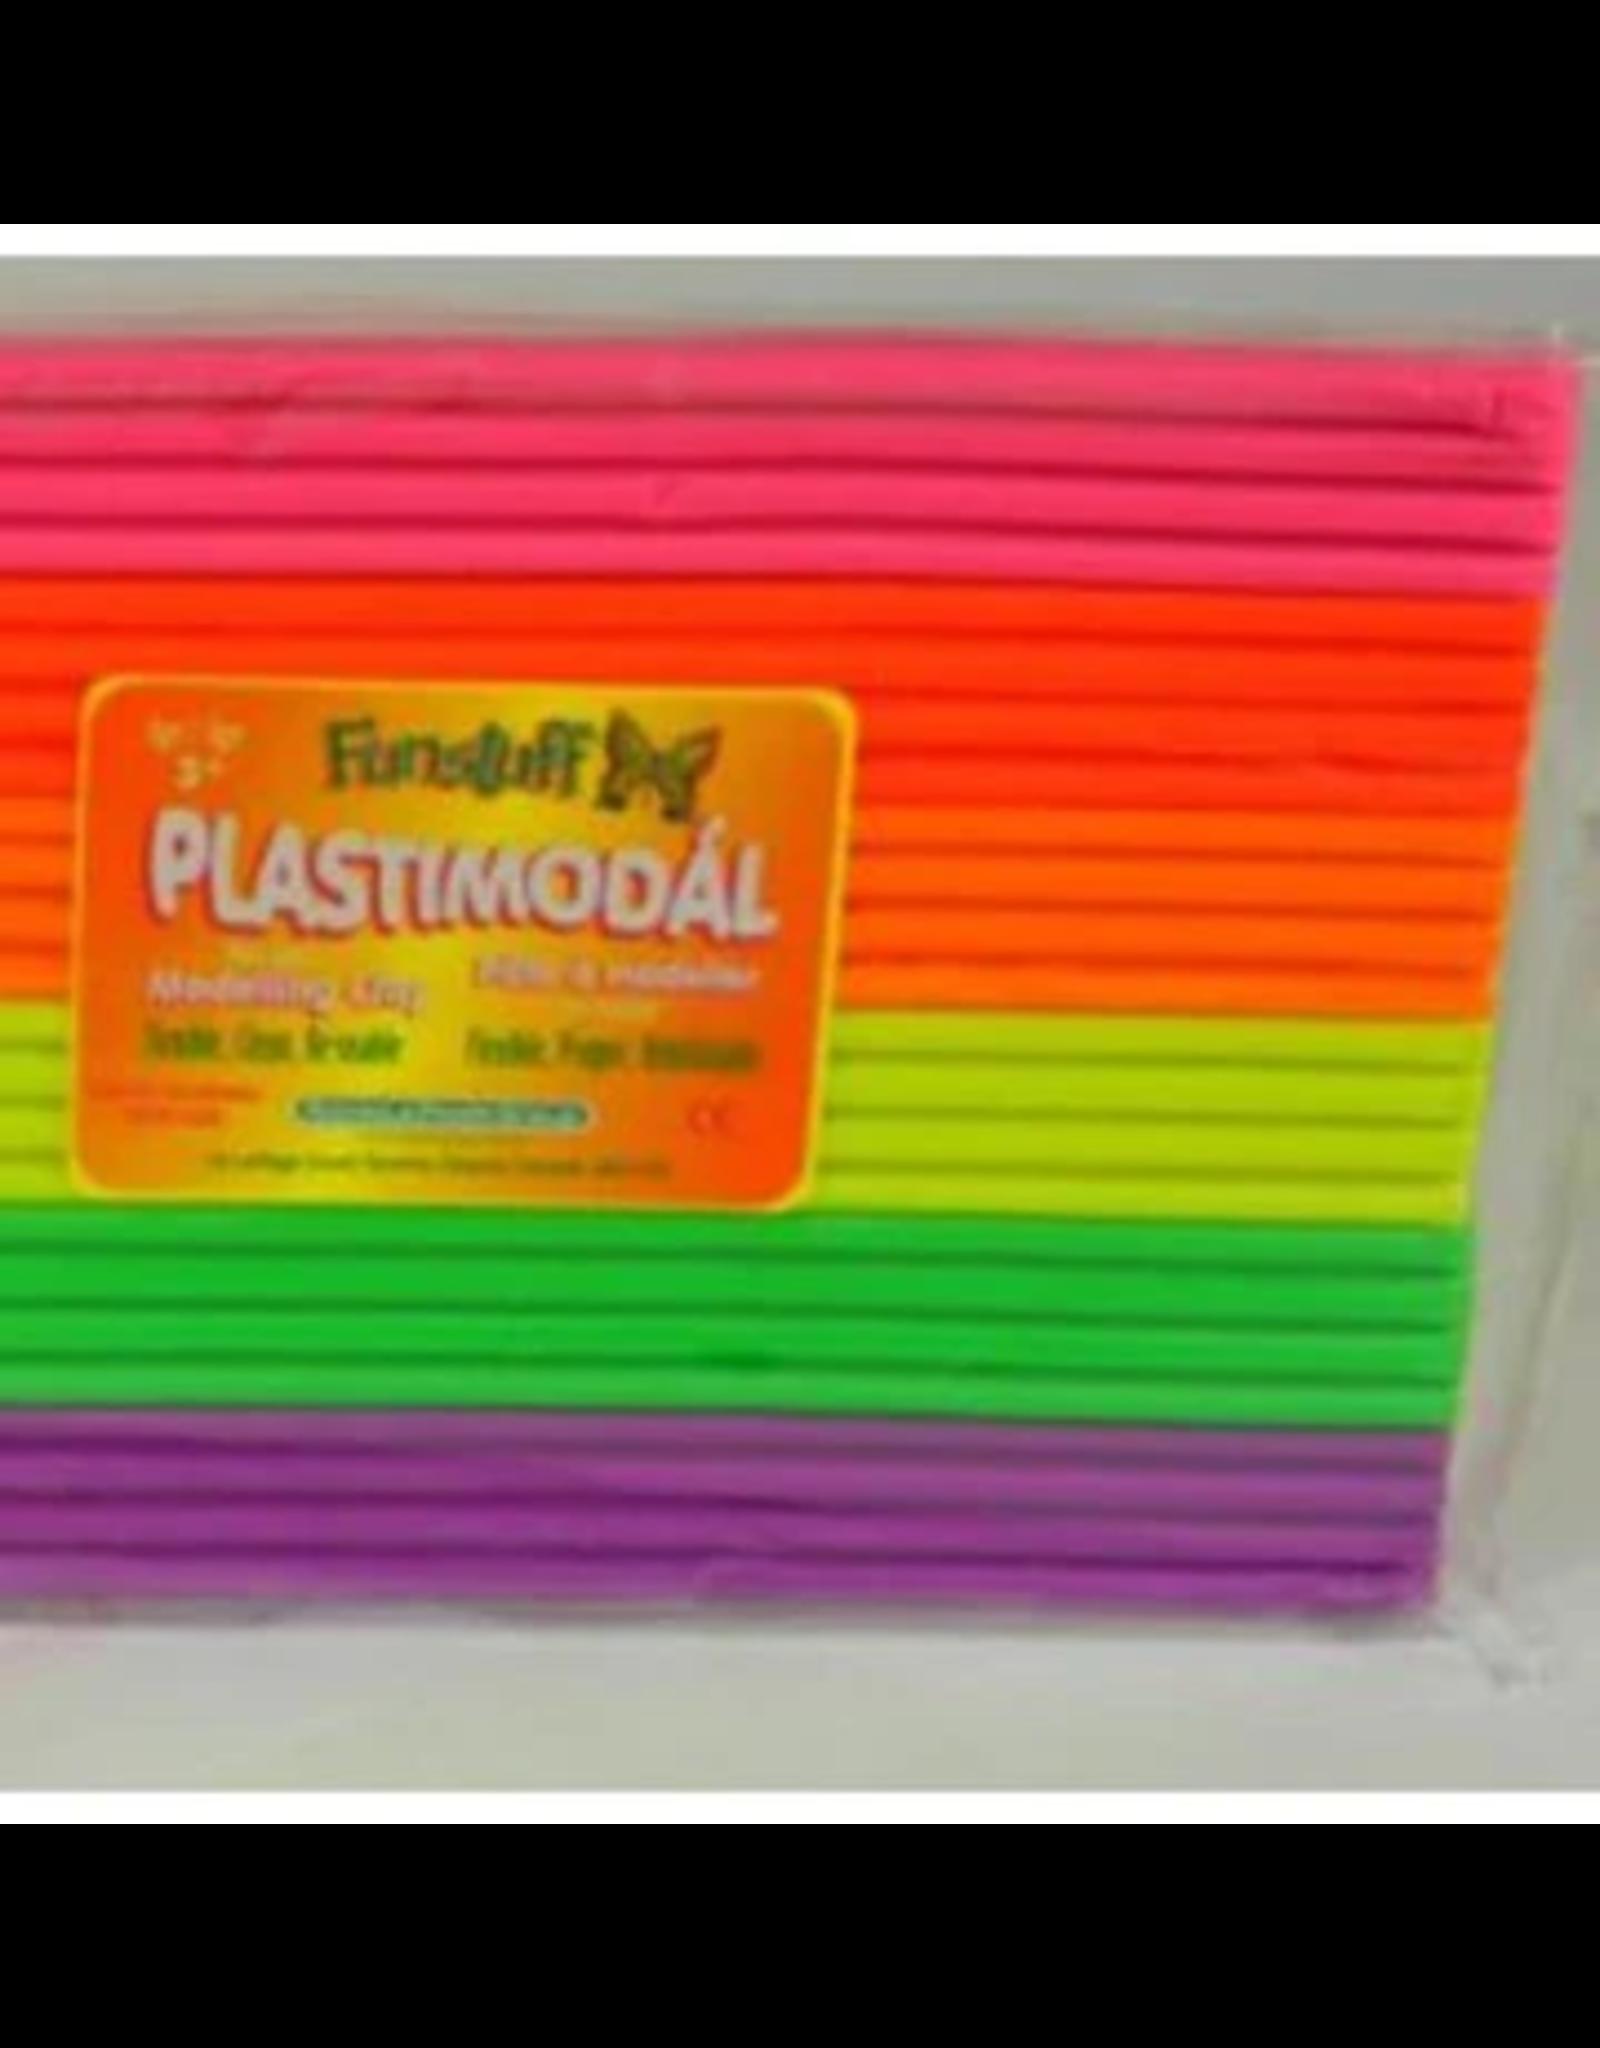 Funstuff Plastimodal Modelling Clay Fluorescent, 300 gr